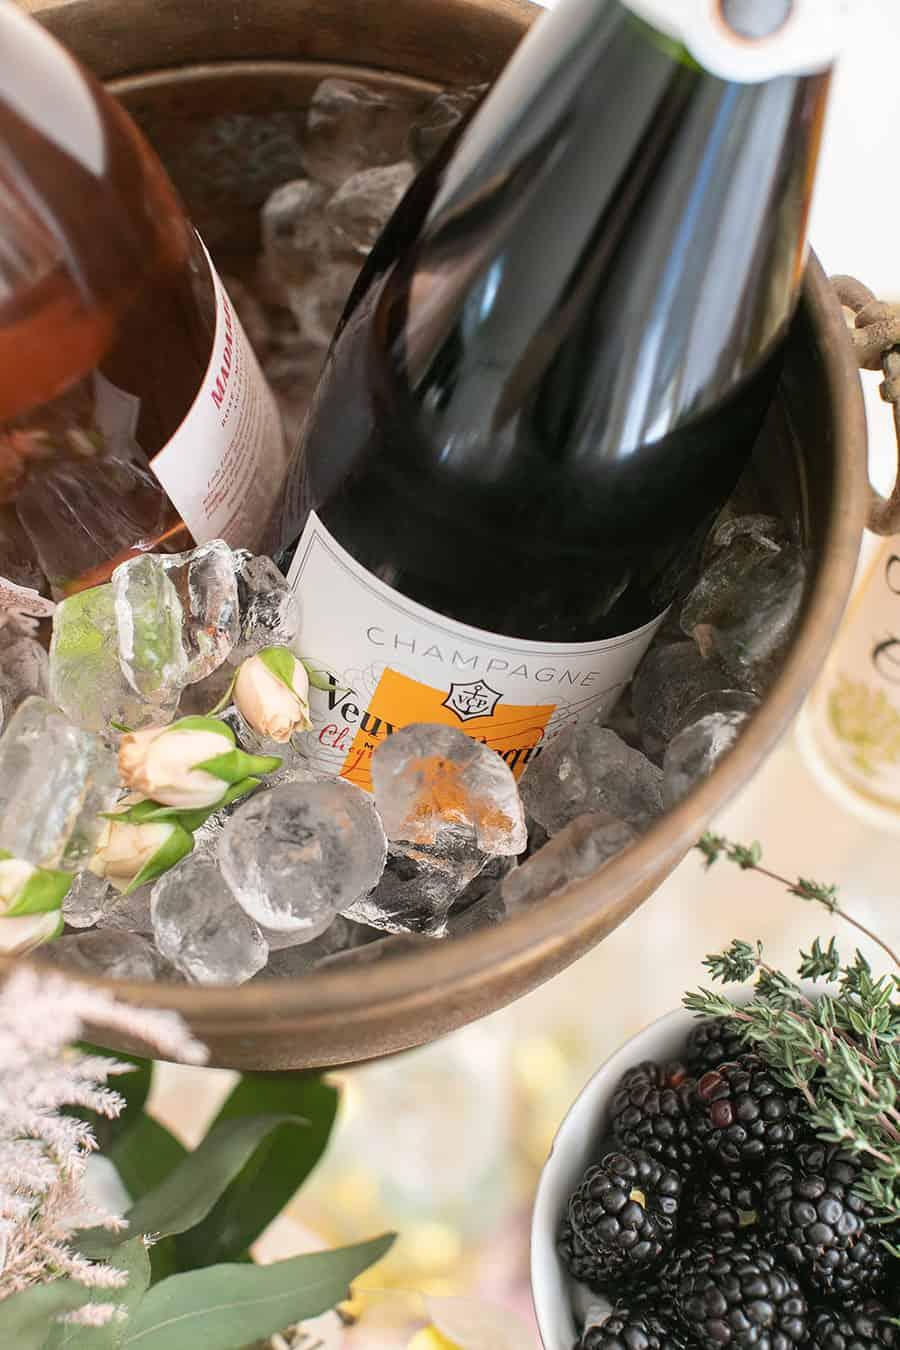 Bottle of Champagne in an ice bucket